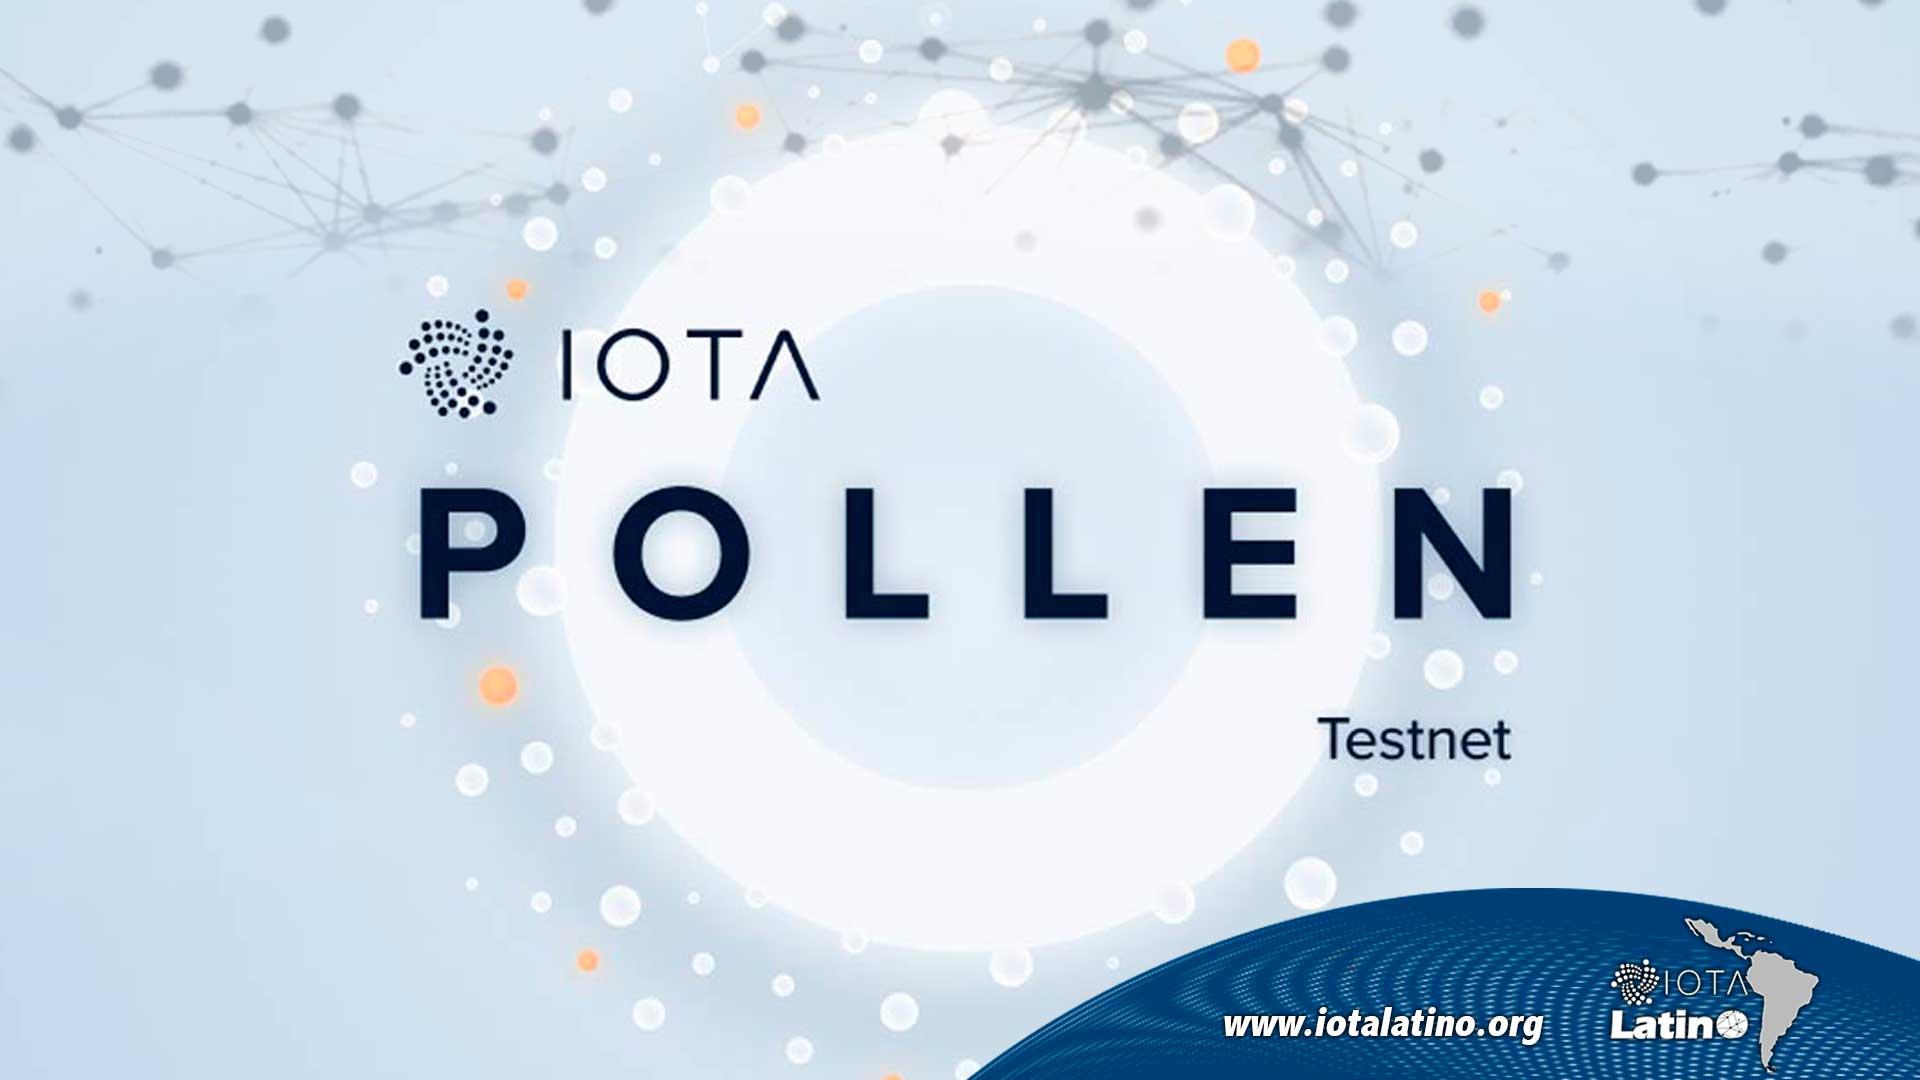 Pollen Testnet V0.2.2 - IOTA Latino